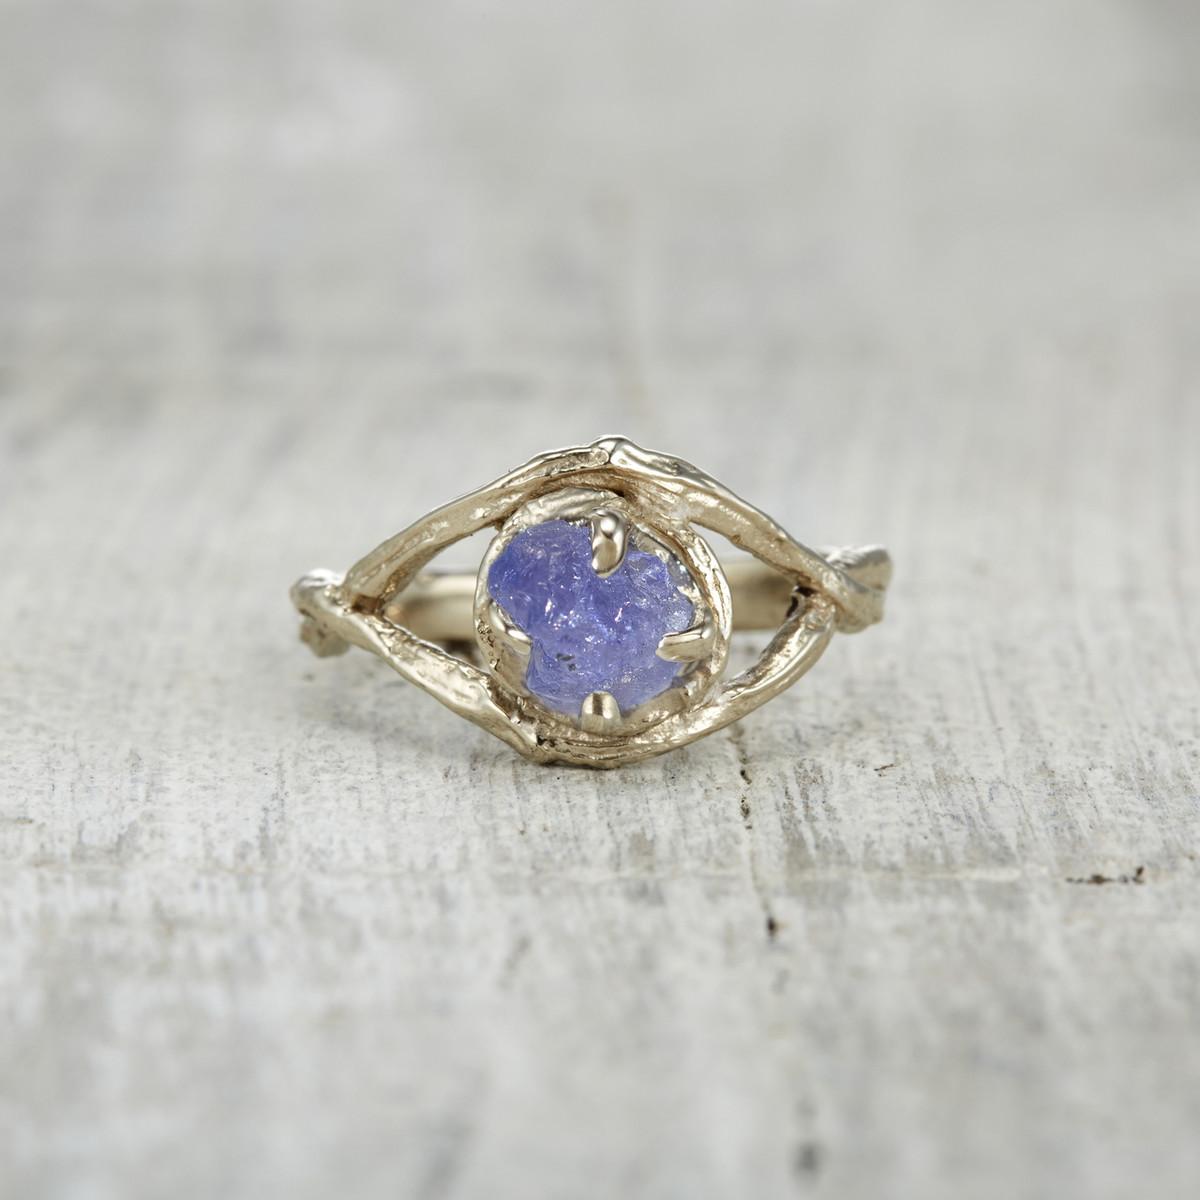 Chelsea Ring - Rough Cut Tanzanite